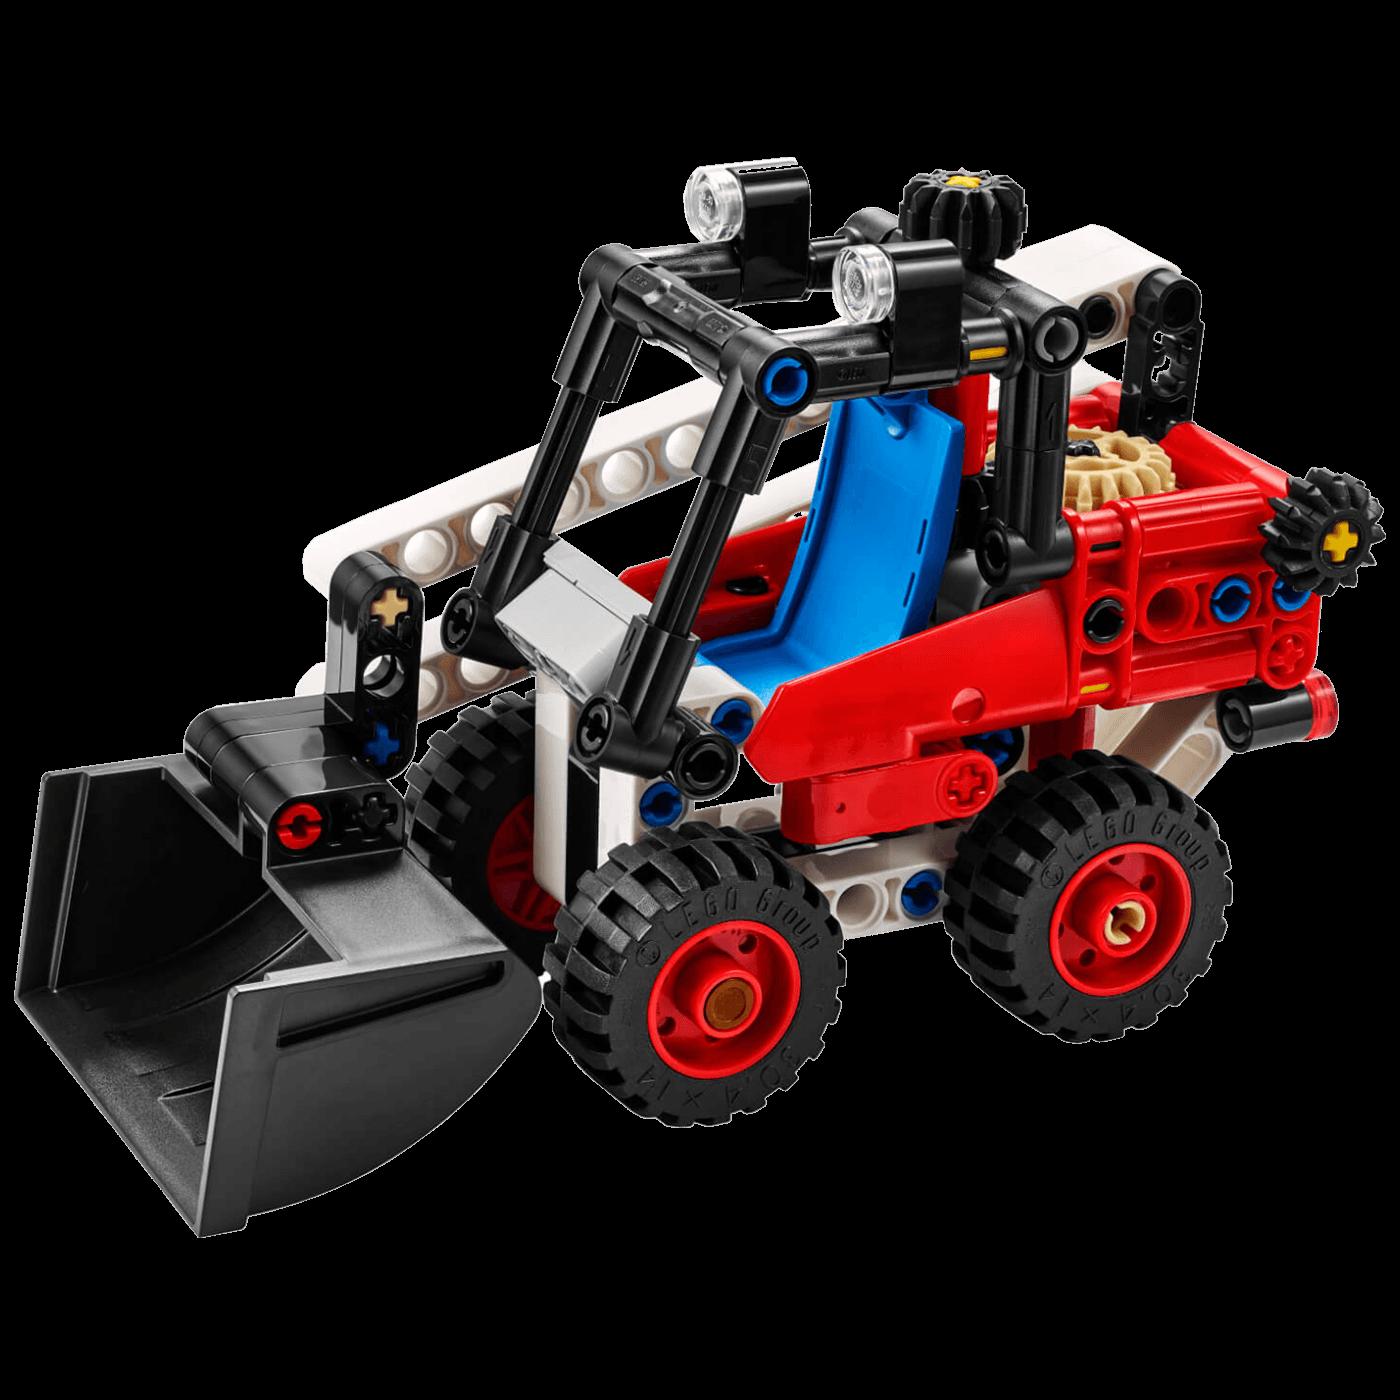 Utovarivač, LEGO Technic